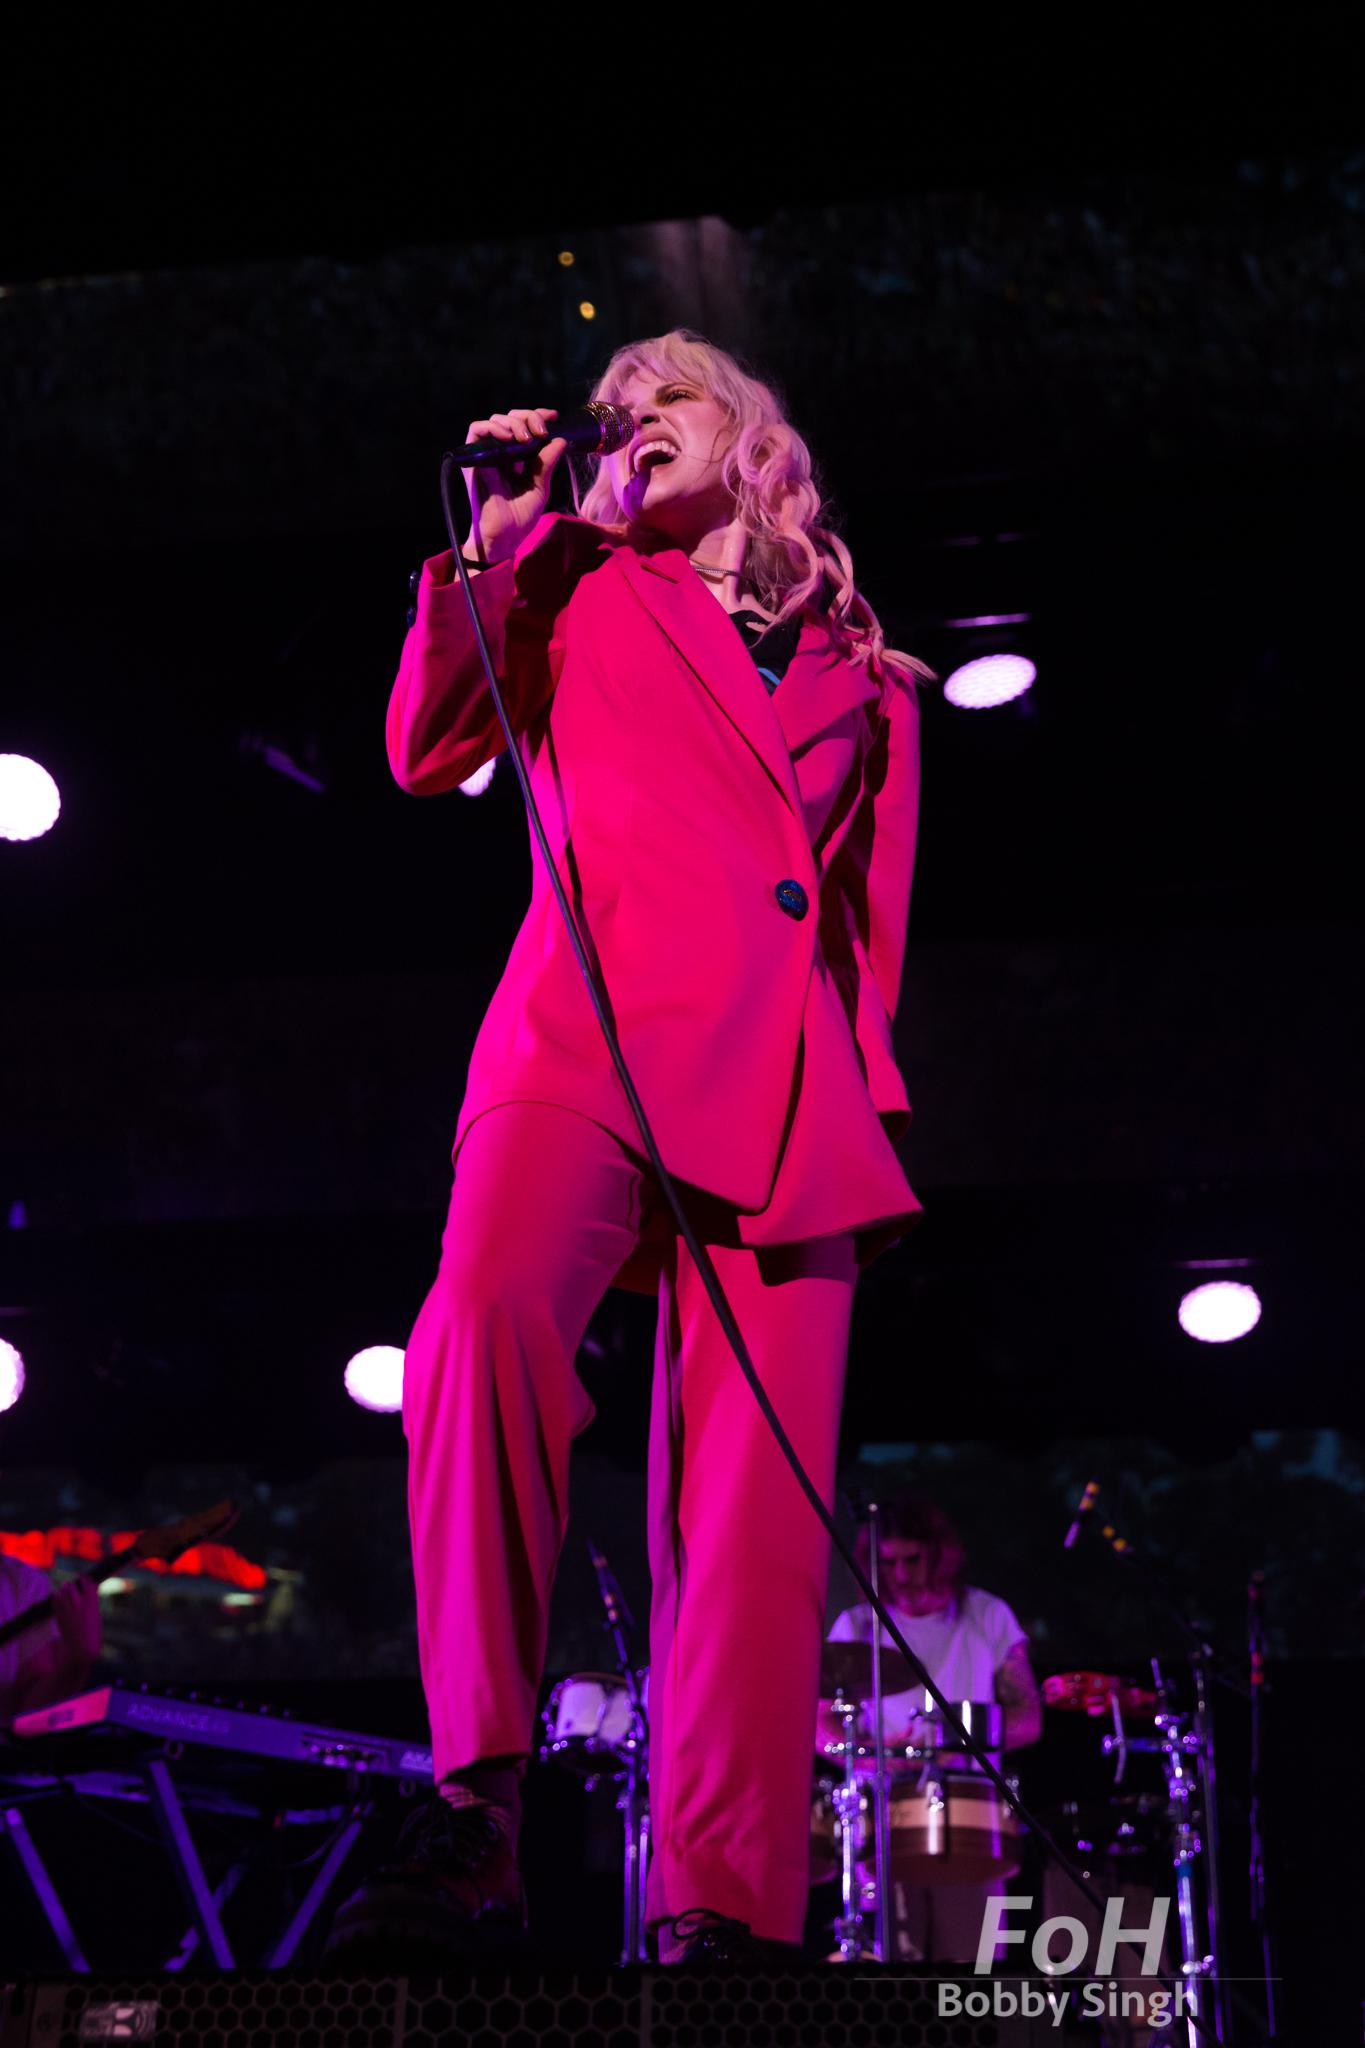 Paramore, Budweiser Stage, Toronto. Bobby Singh/@fohphoto